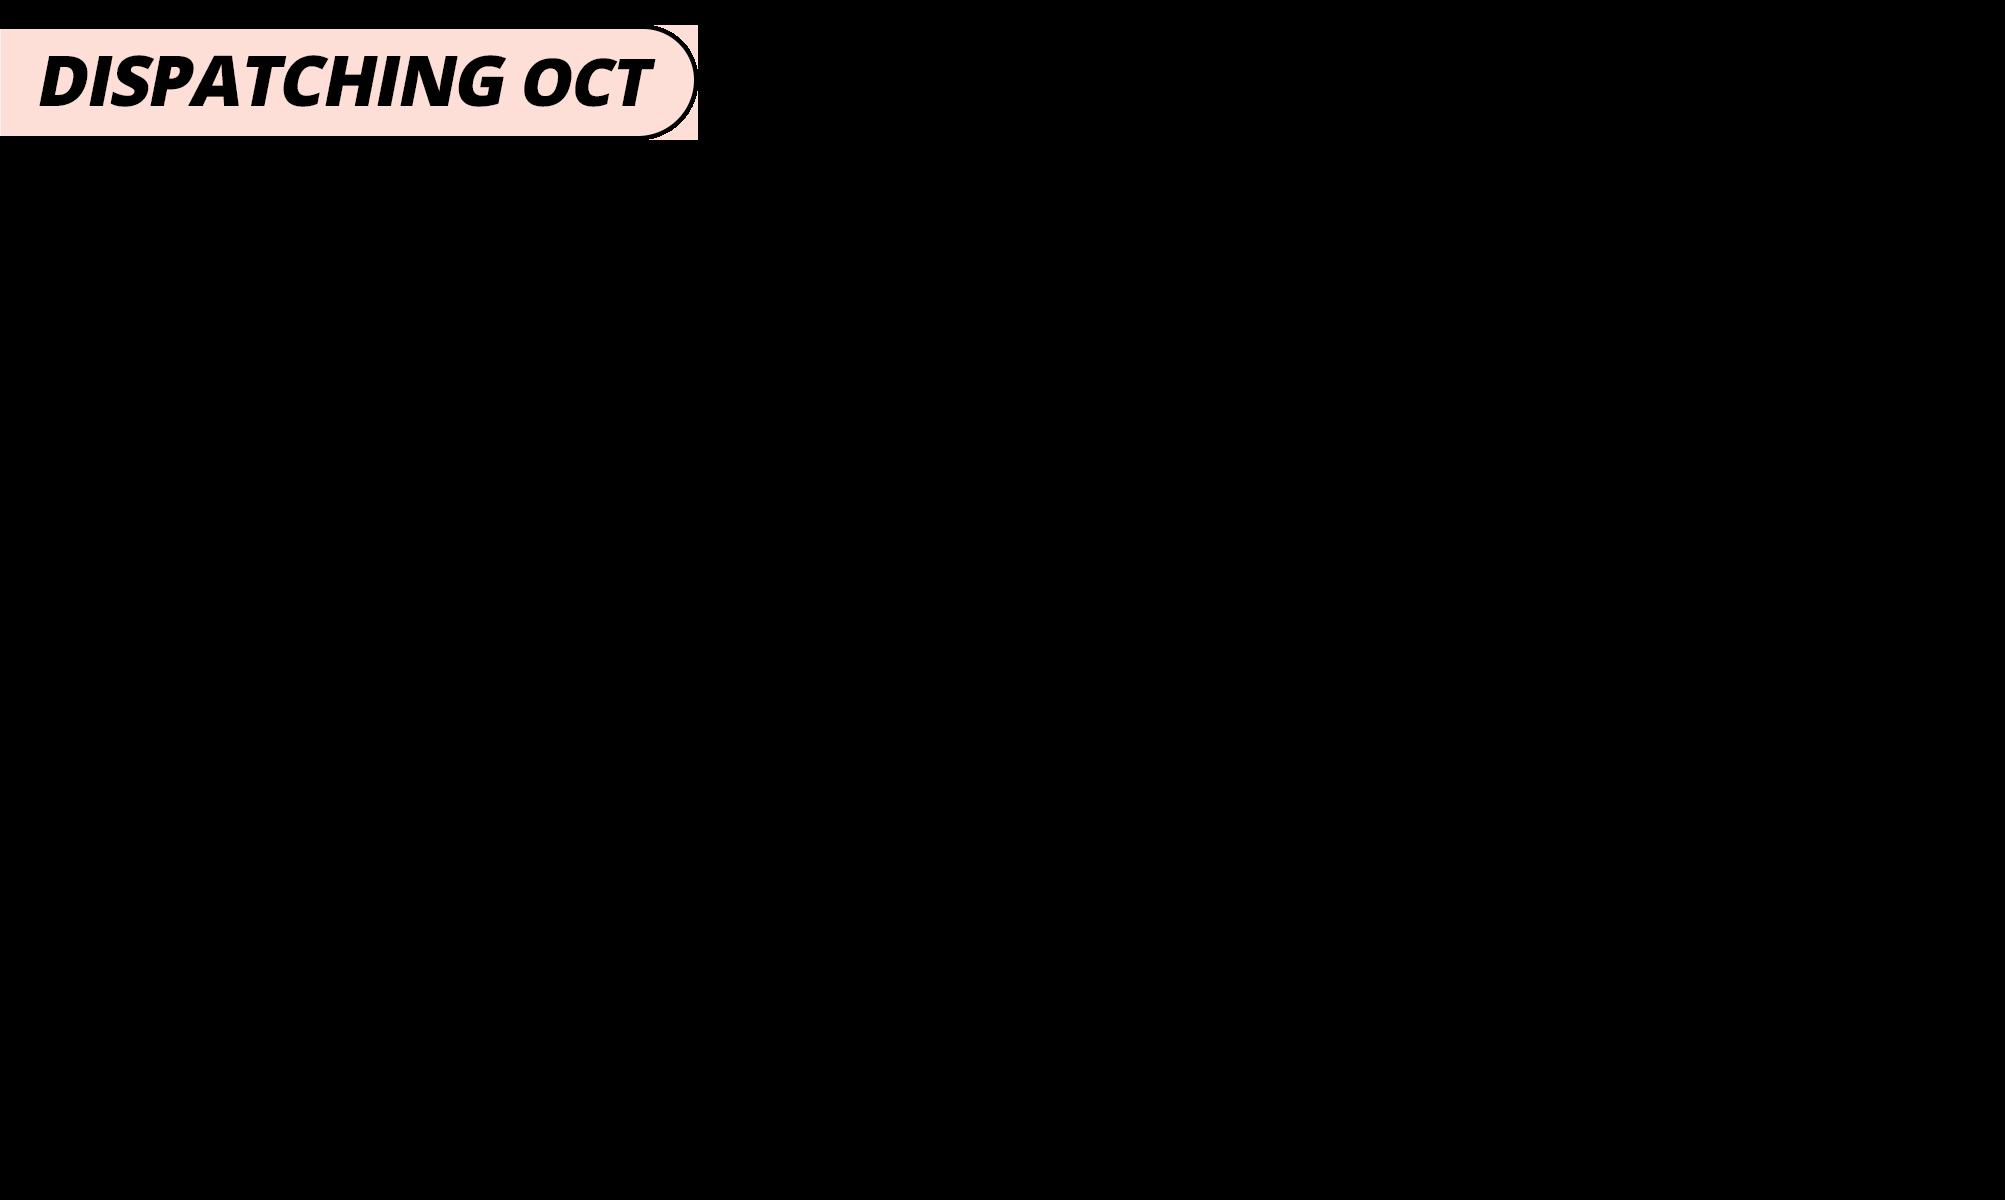 Dispatching oct   peach